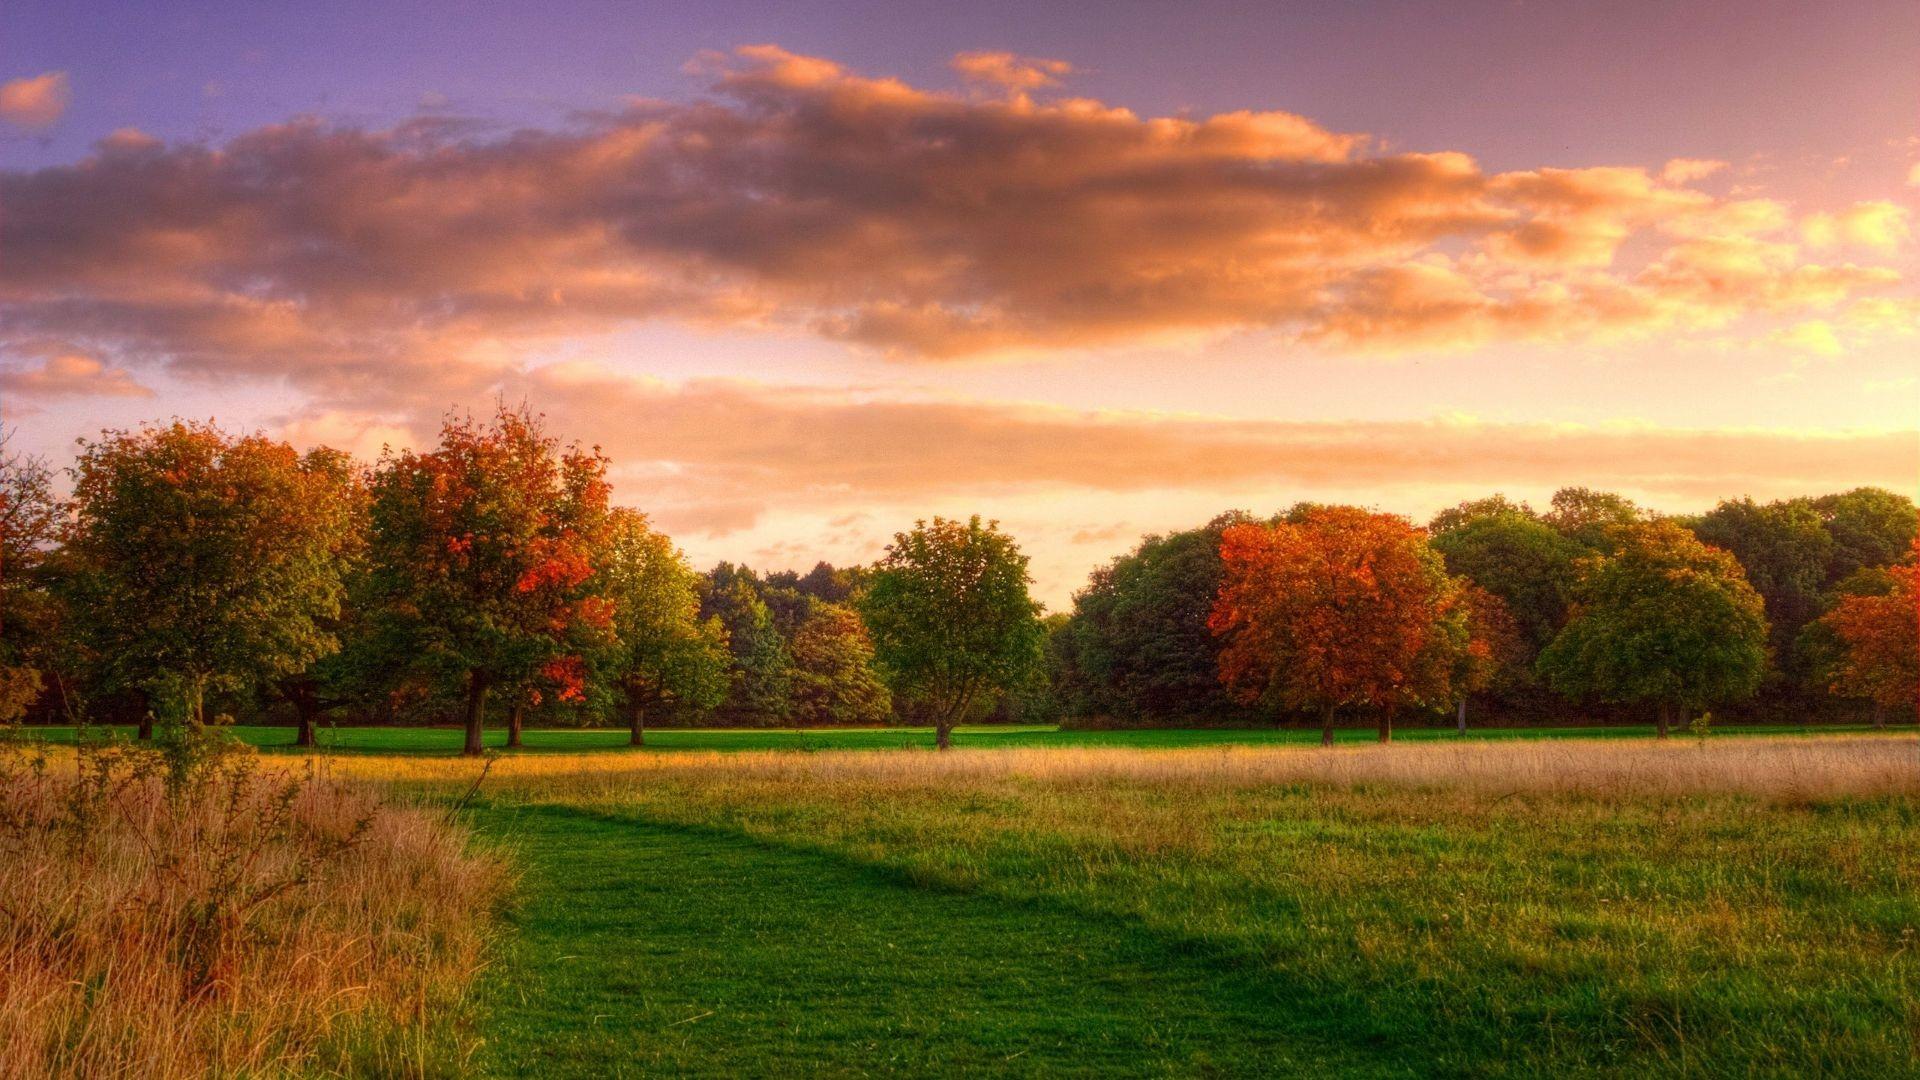 Natural-landscape-autumn-sunrise-forest-sky-clouds_2560x1600